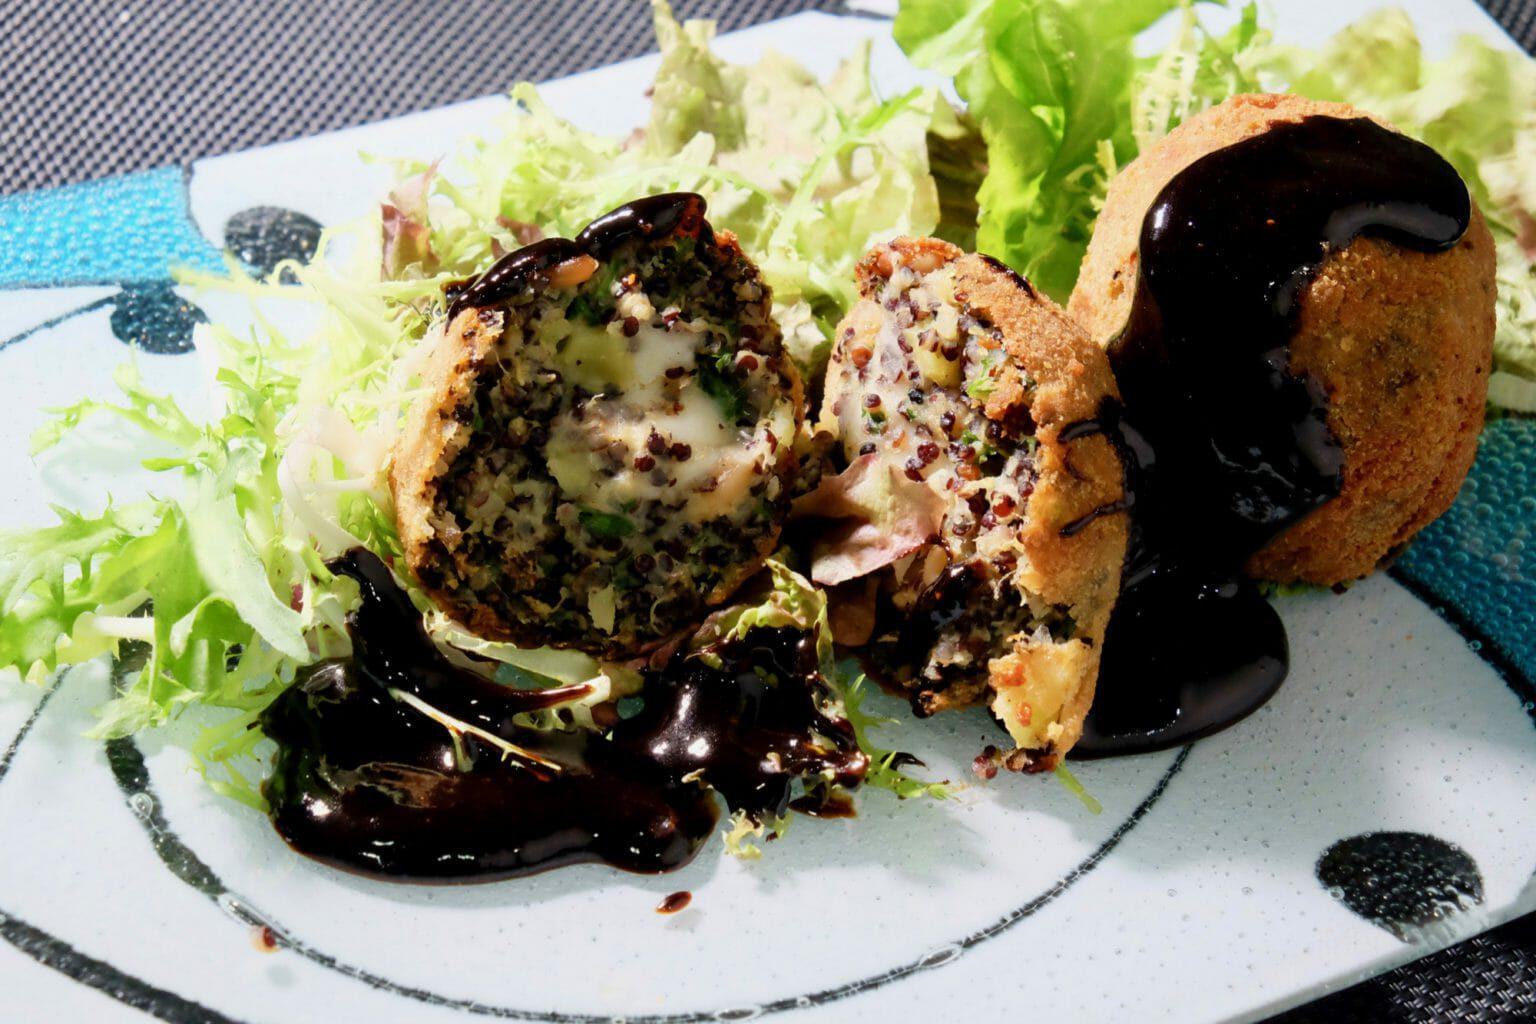 sweet-potato-quinoa-arancini-balls-balsamic-black-garlic-sauce